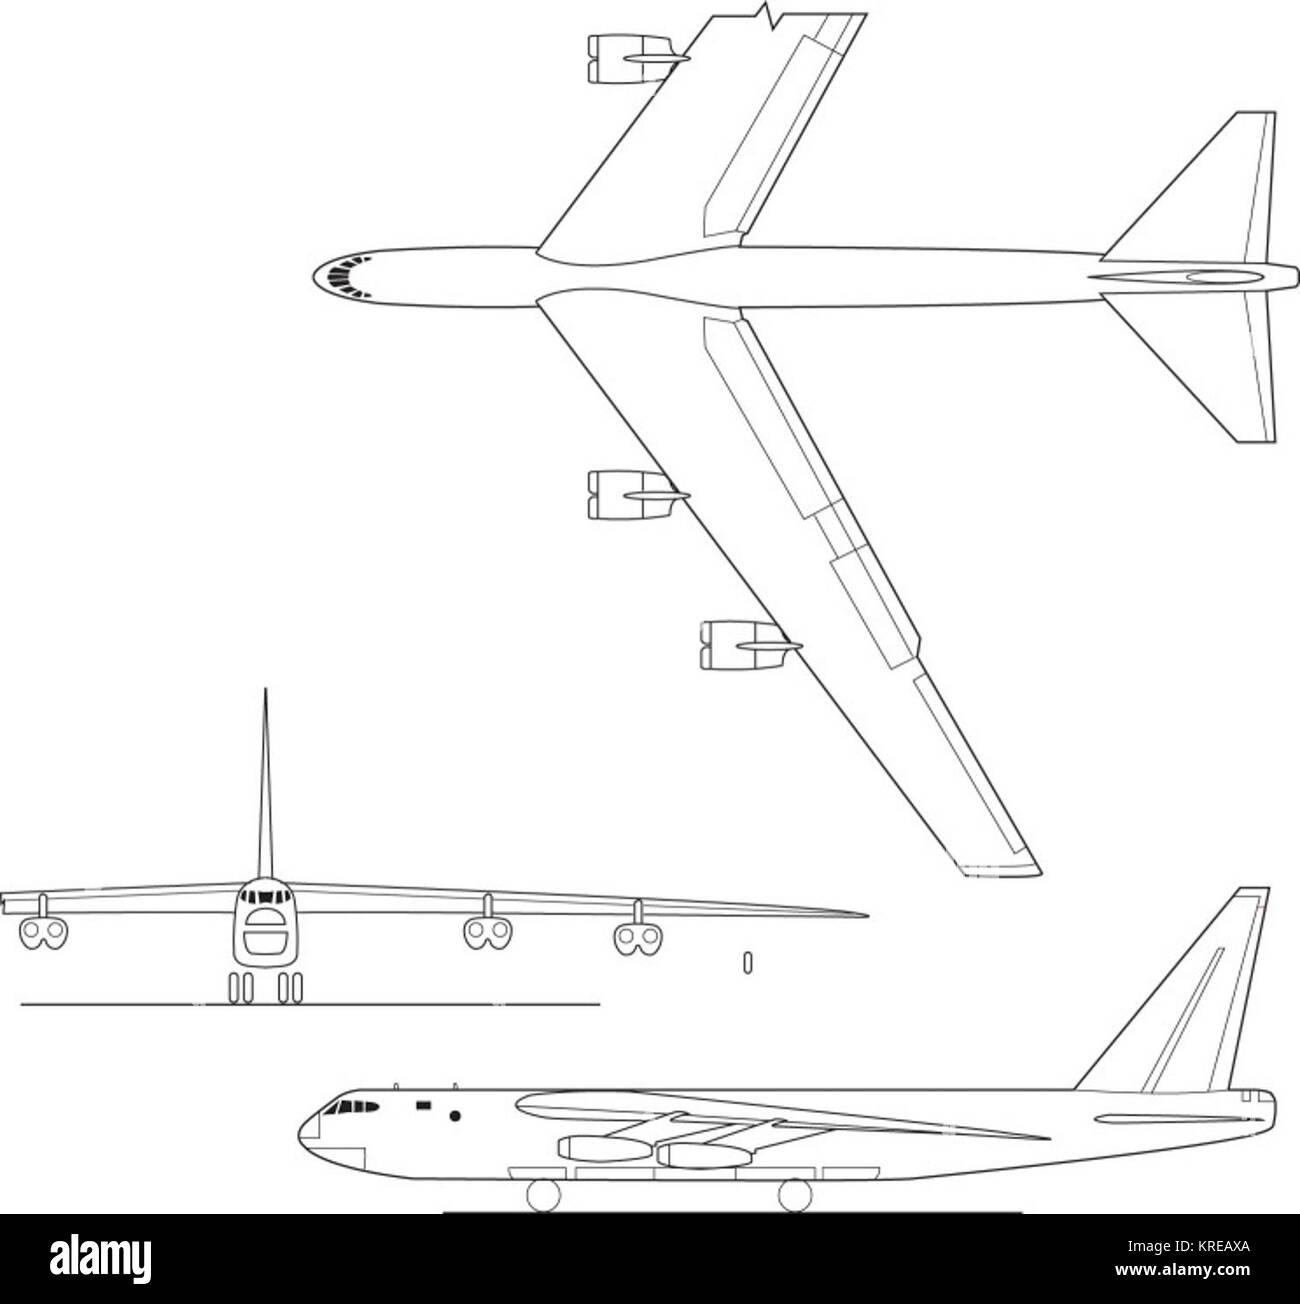 B-52 3-view Stock Photo: 169346306 - Alamy